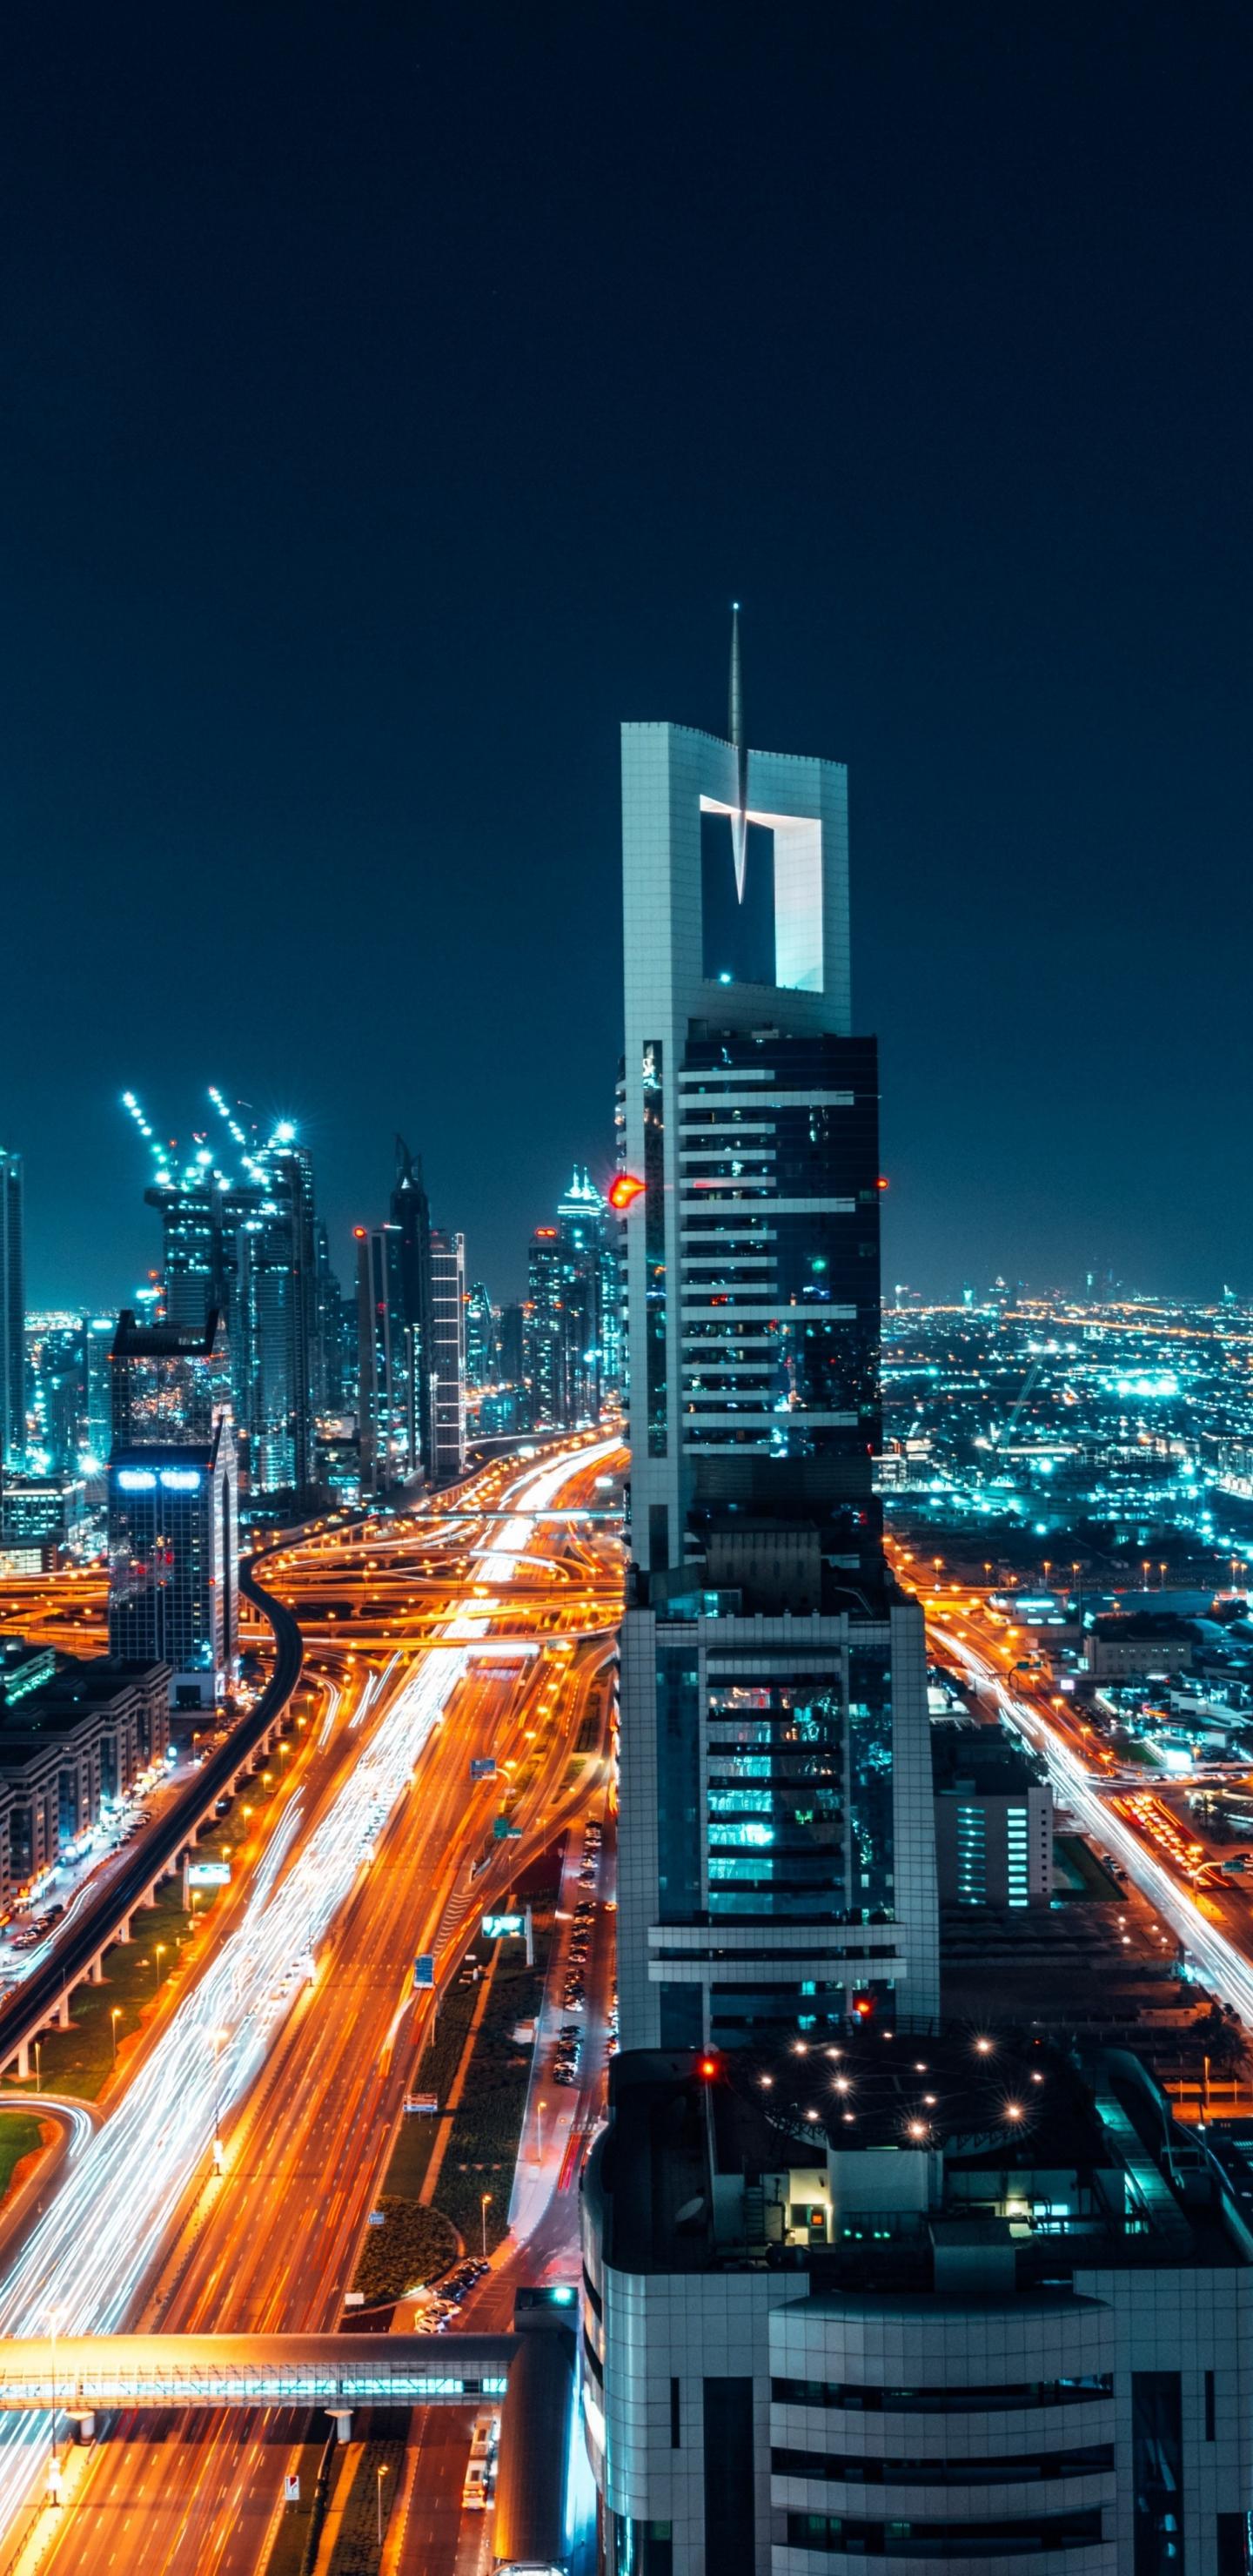 Download 1440x2960 Wallpaper Dubai City Buildings